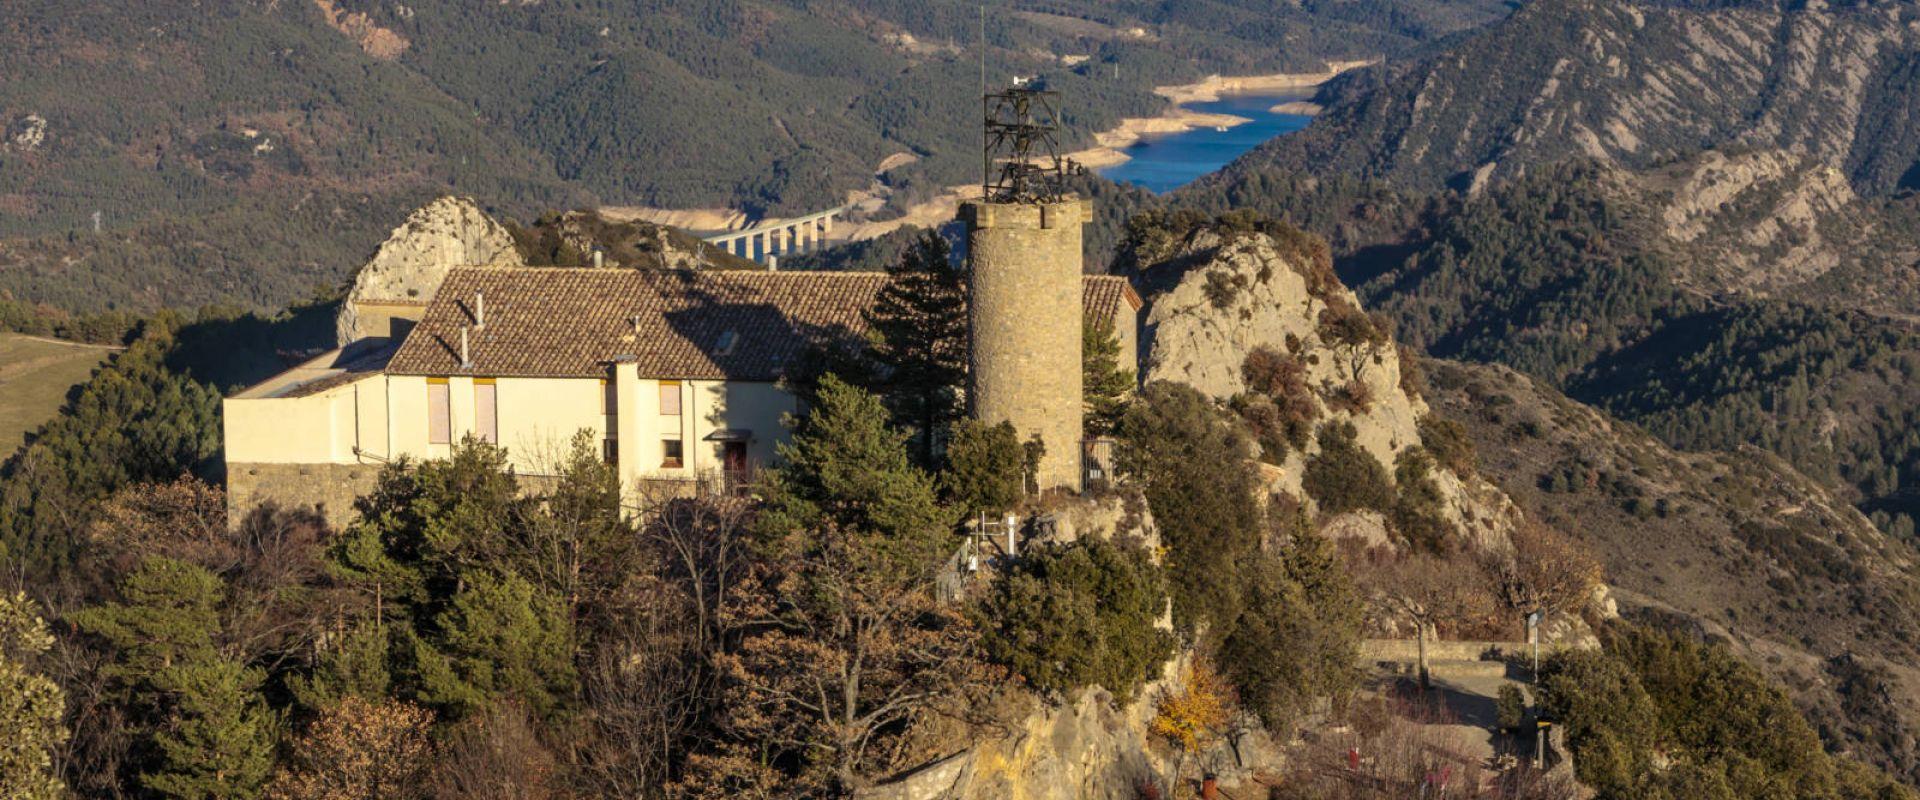 Kleiner Tourenguide: Katalanische Pyrenäen I